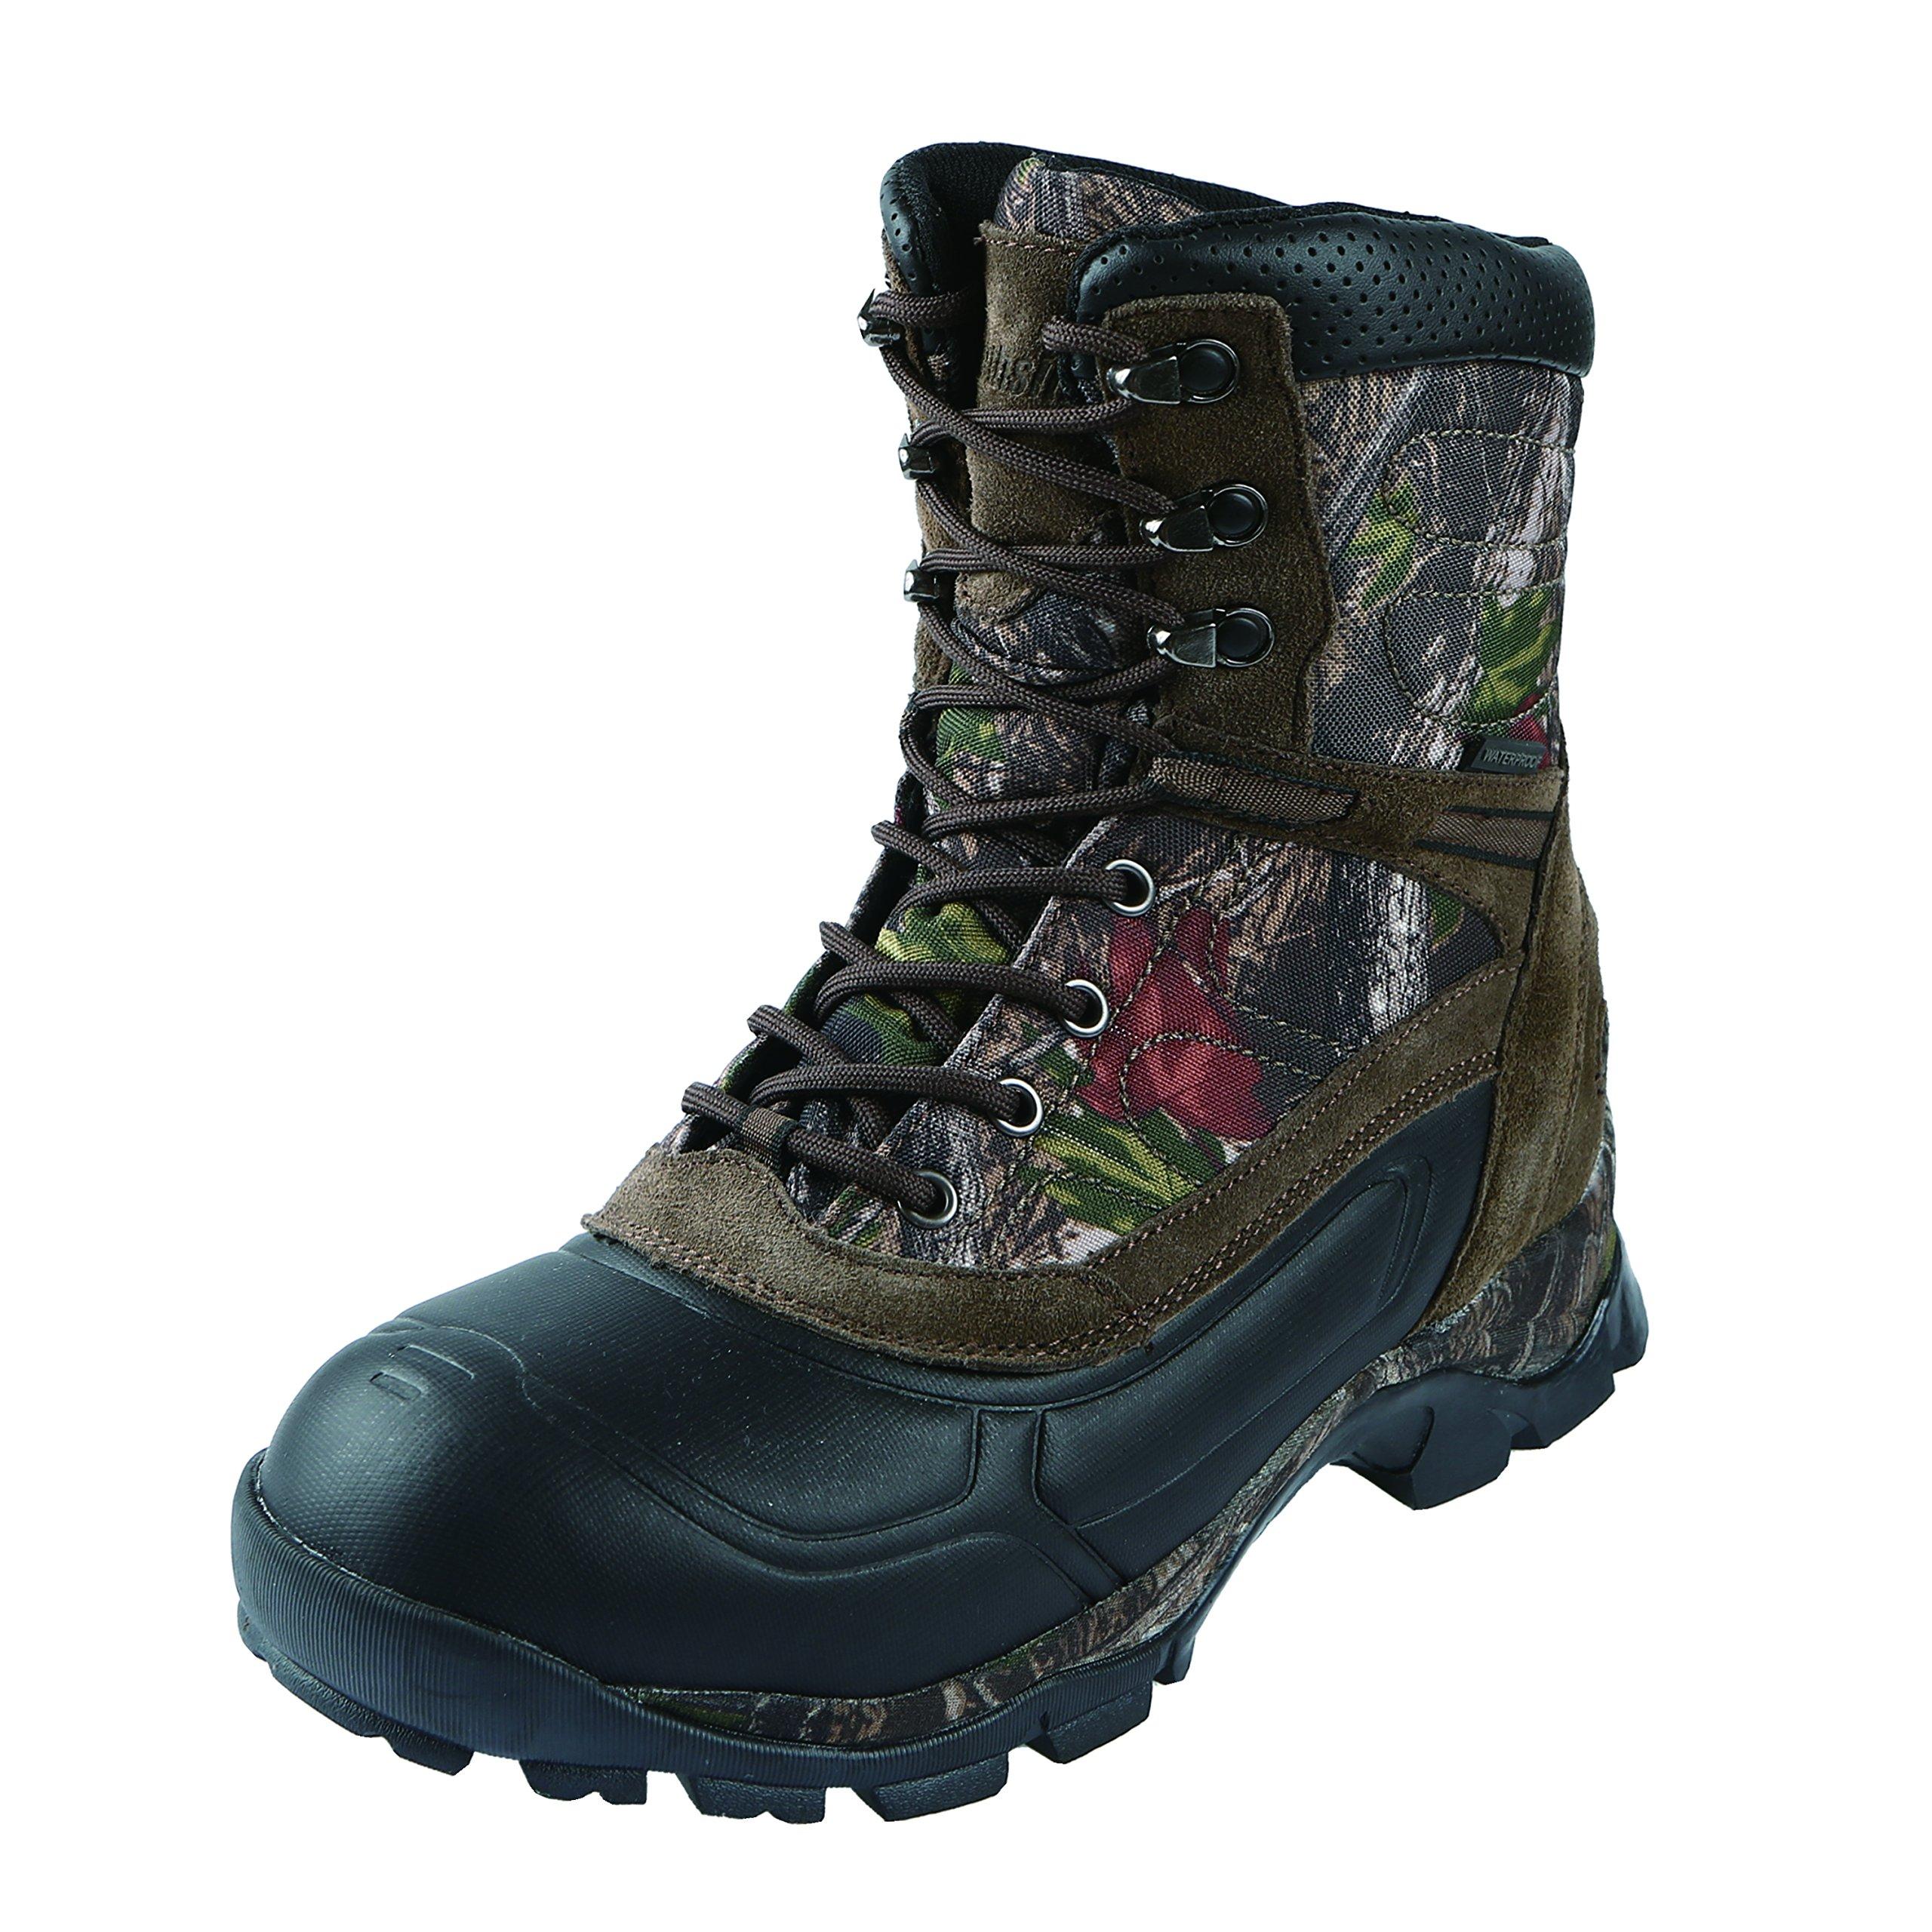 Northside Men's Banshee 600 Hunting Boot, Brown Camo, 11 M US